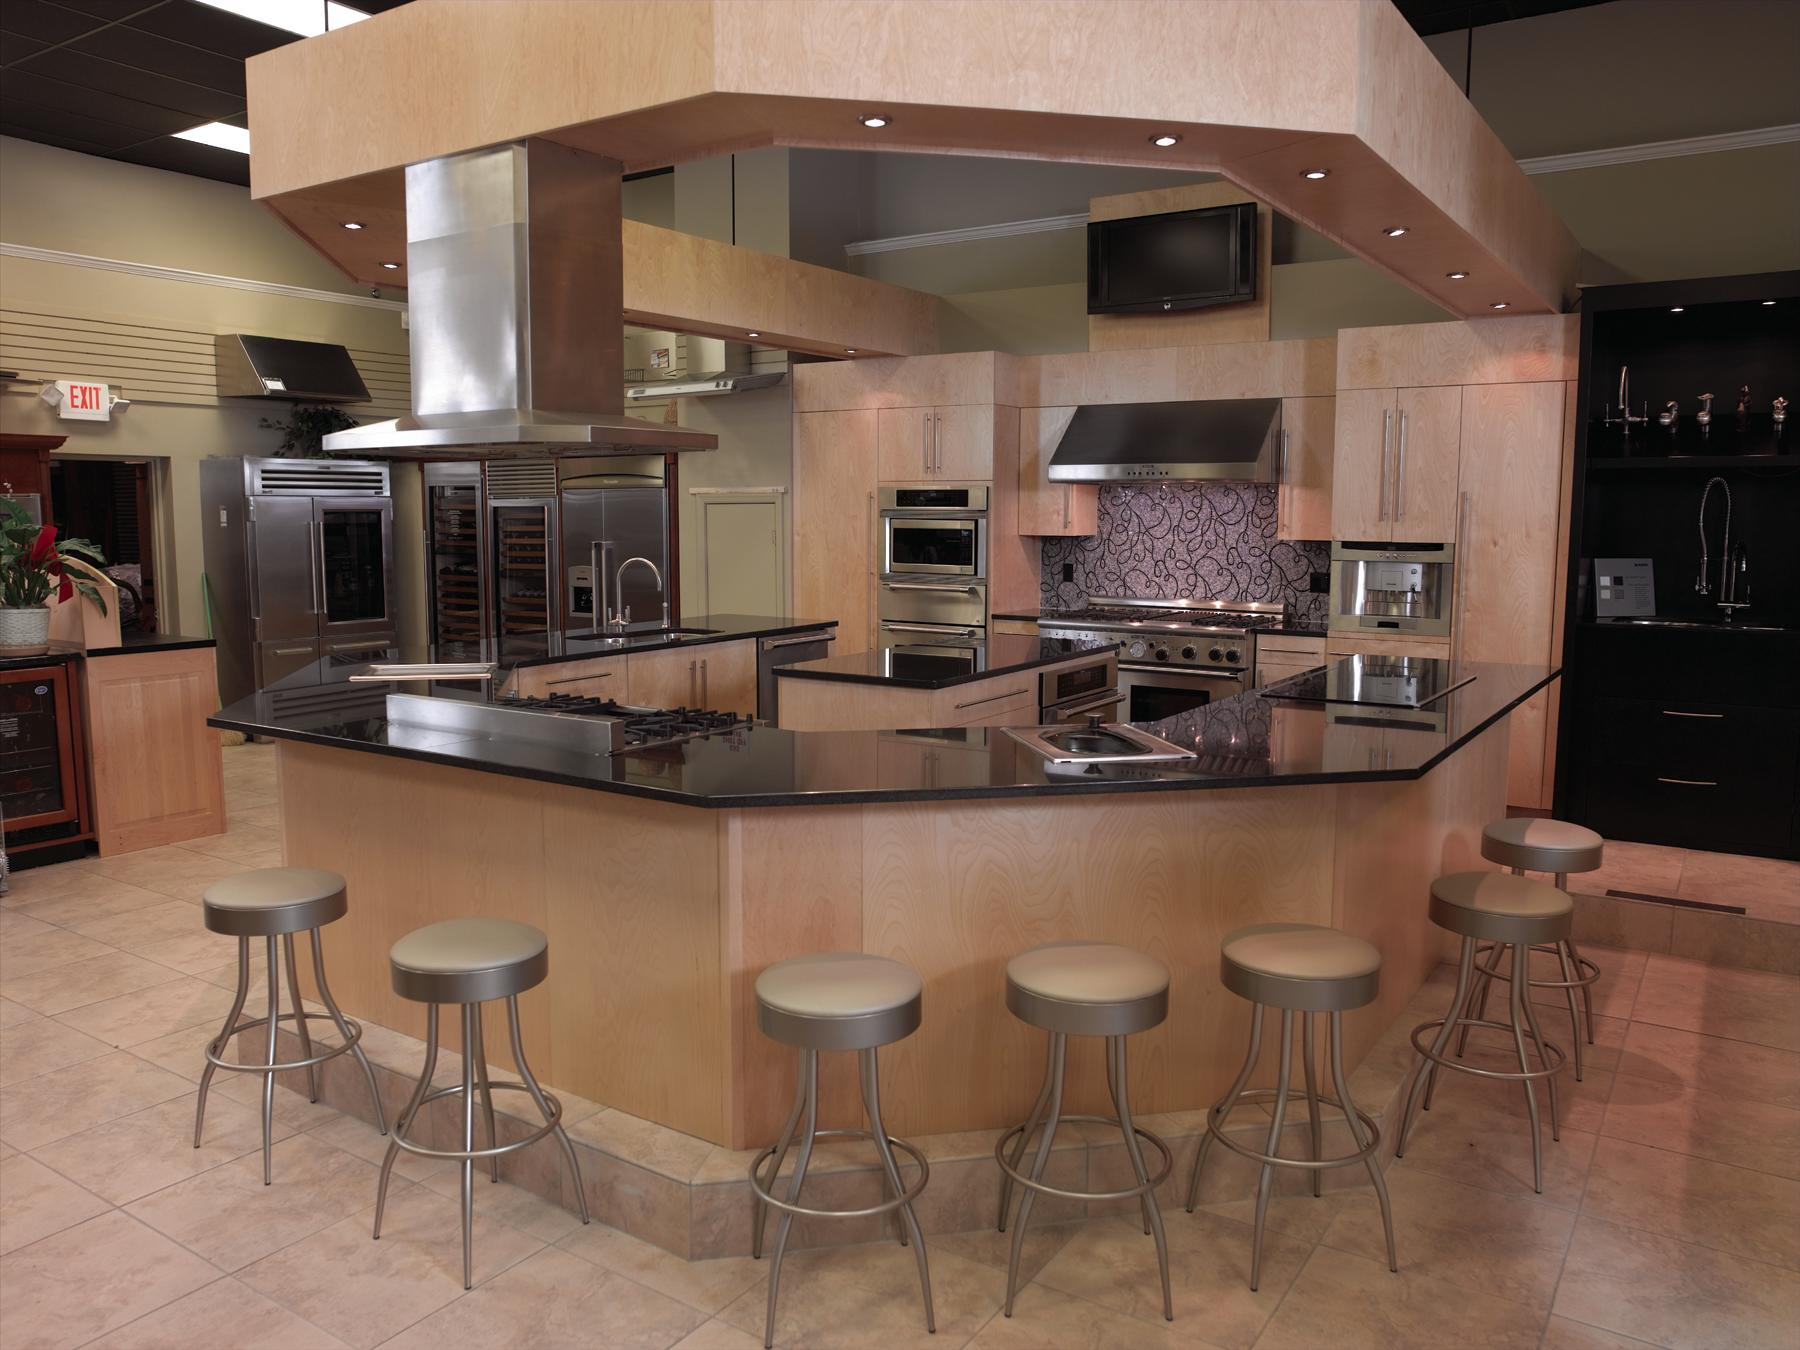 Garden City, NY hampton appliance | Find hampton appliance in Garden ...